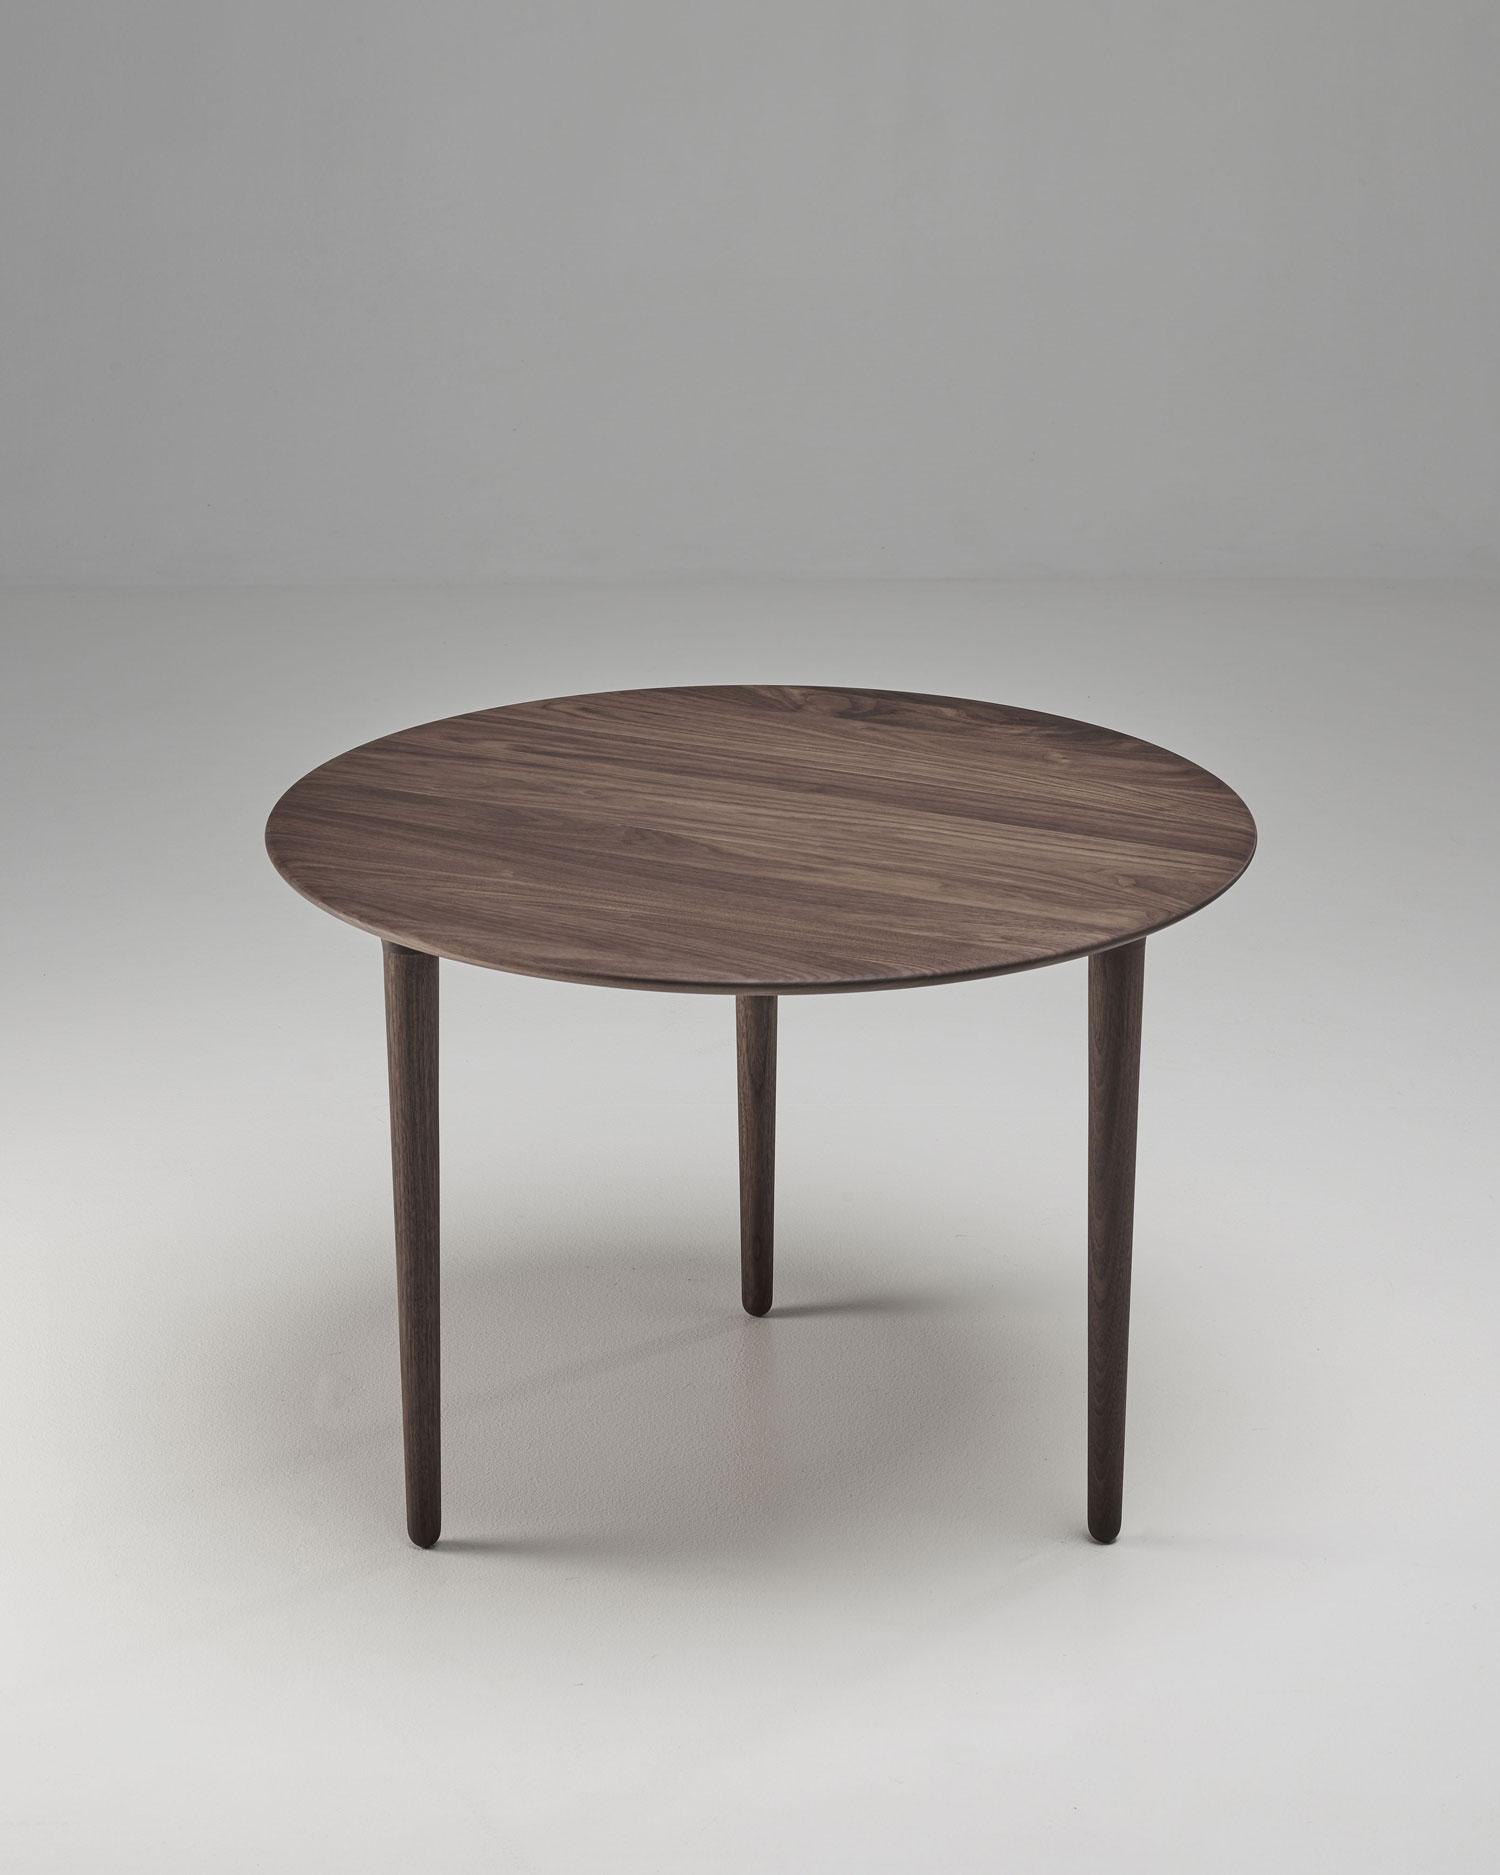 Stylecraft Eikund Evja Coffee Table Mid Century Design Photo Tom Haga Yellowtrace 01